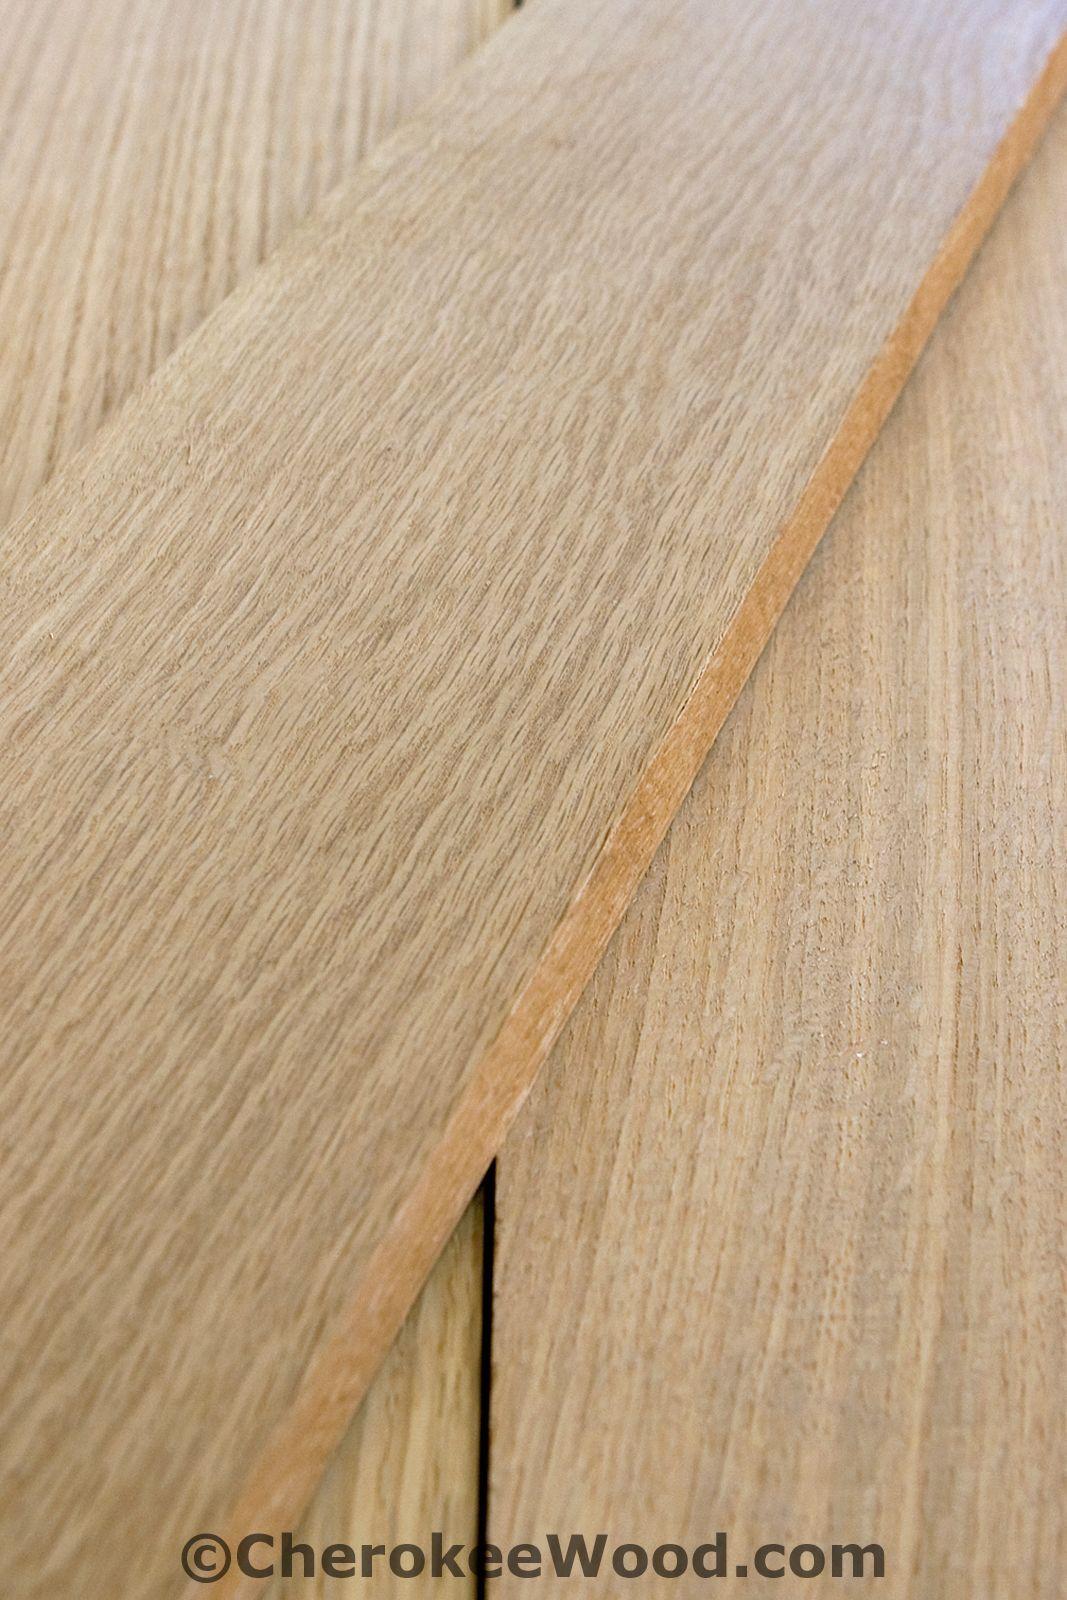 25 Board Feet White Oak Rift & Quarter Sawn Lumber 4 4